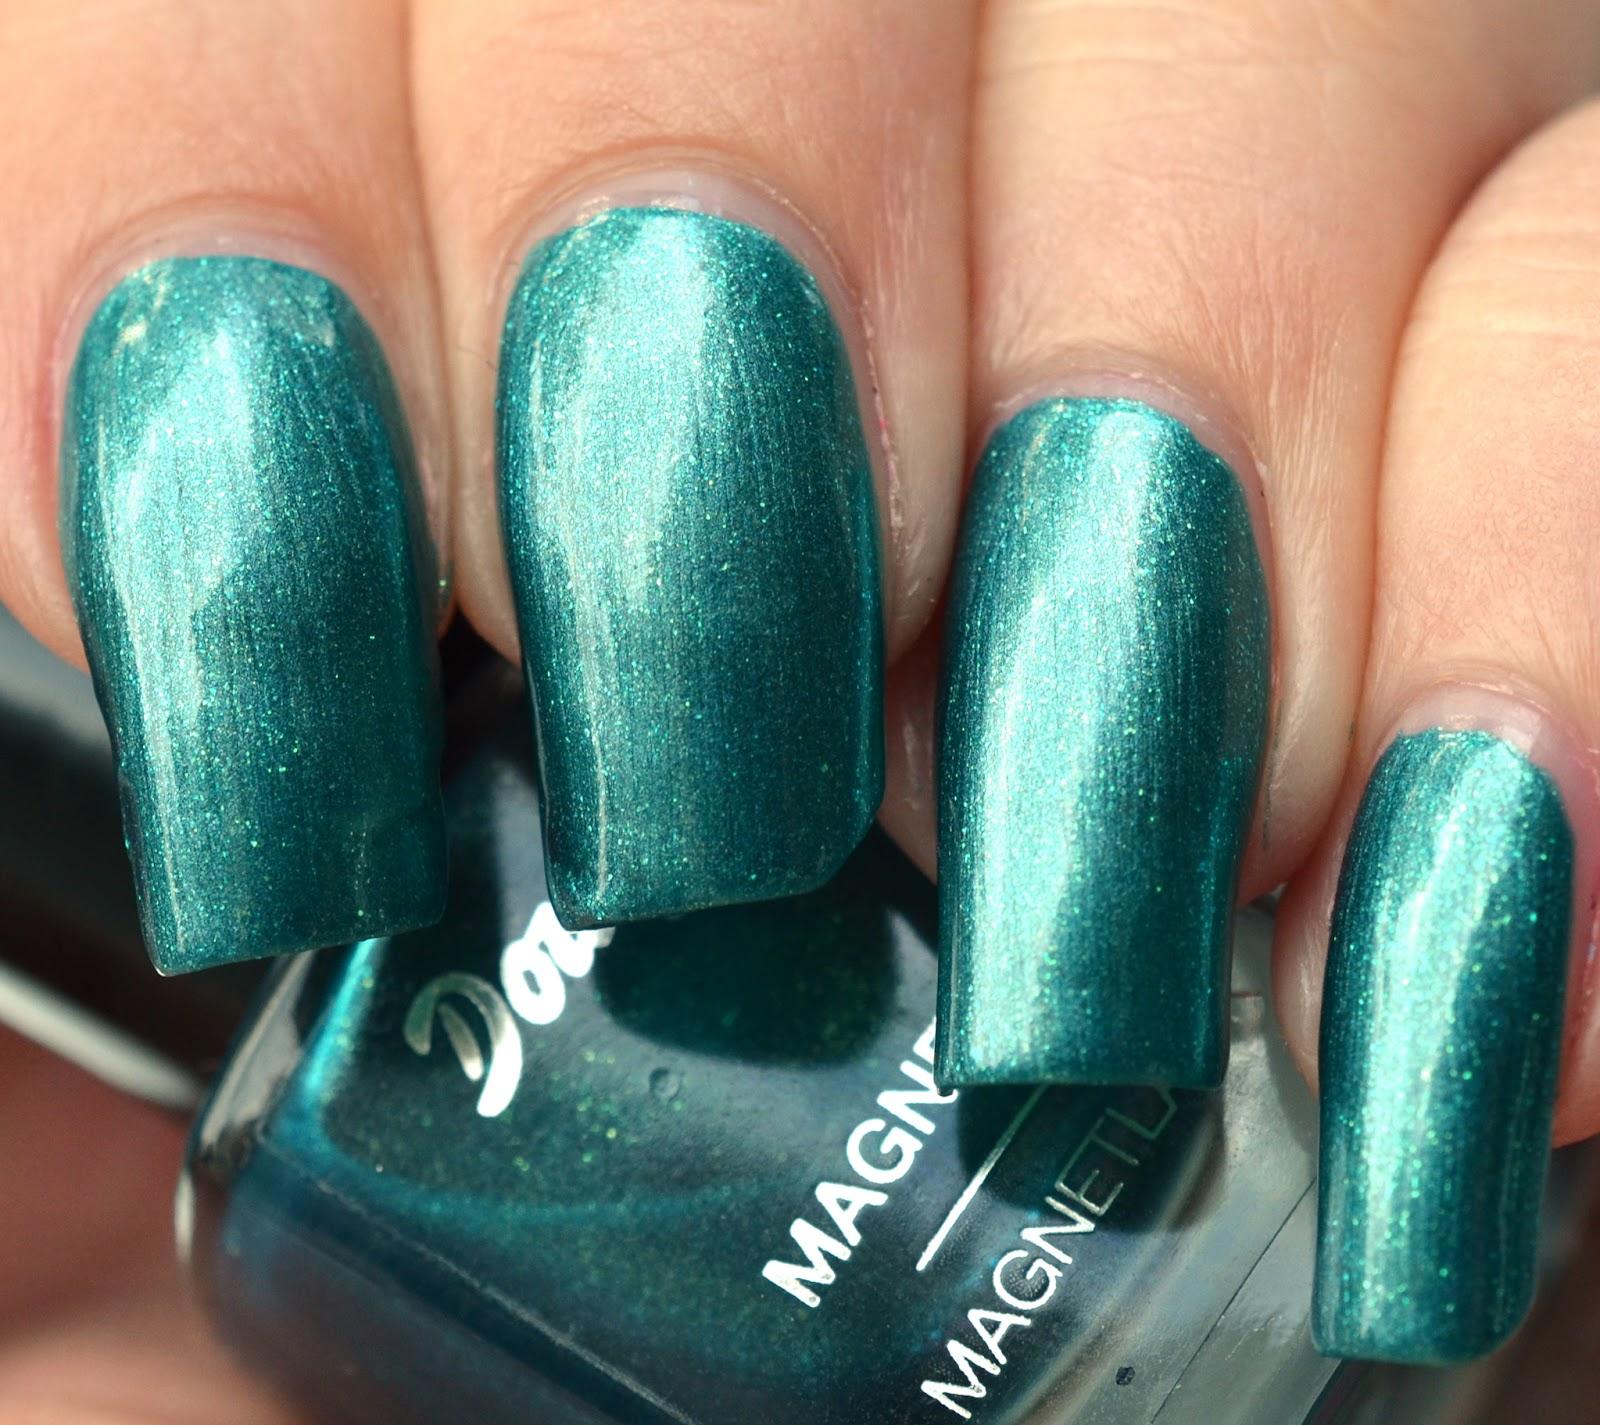 lenas sofa douglas nails 3d nail varnish turquoise. Black Bedroom Furniture Sets. Home Design Ideas